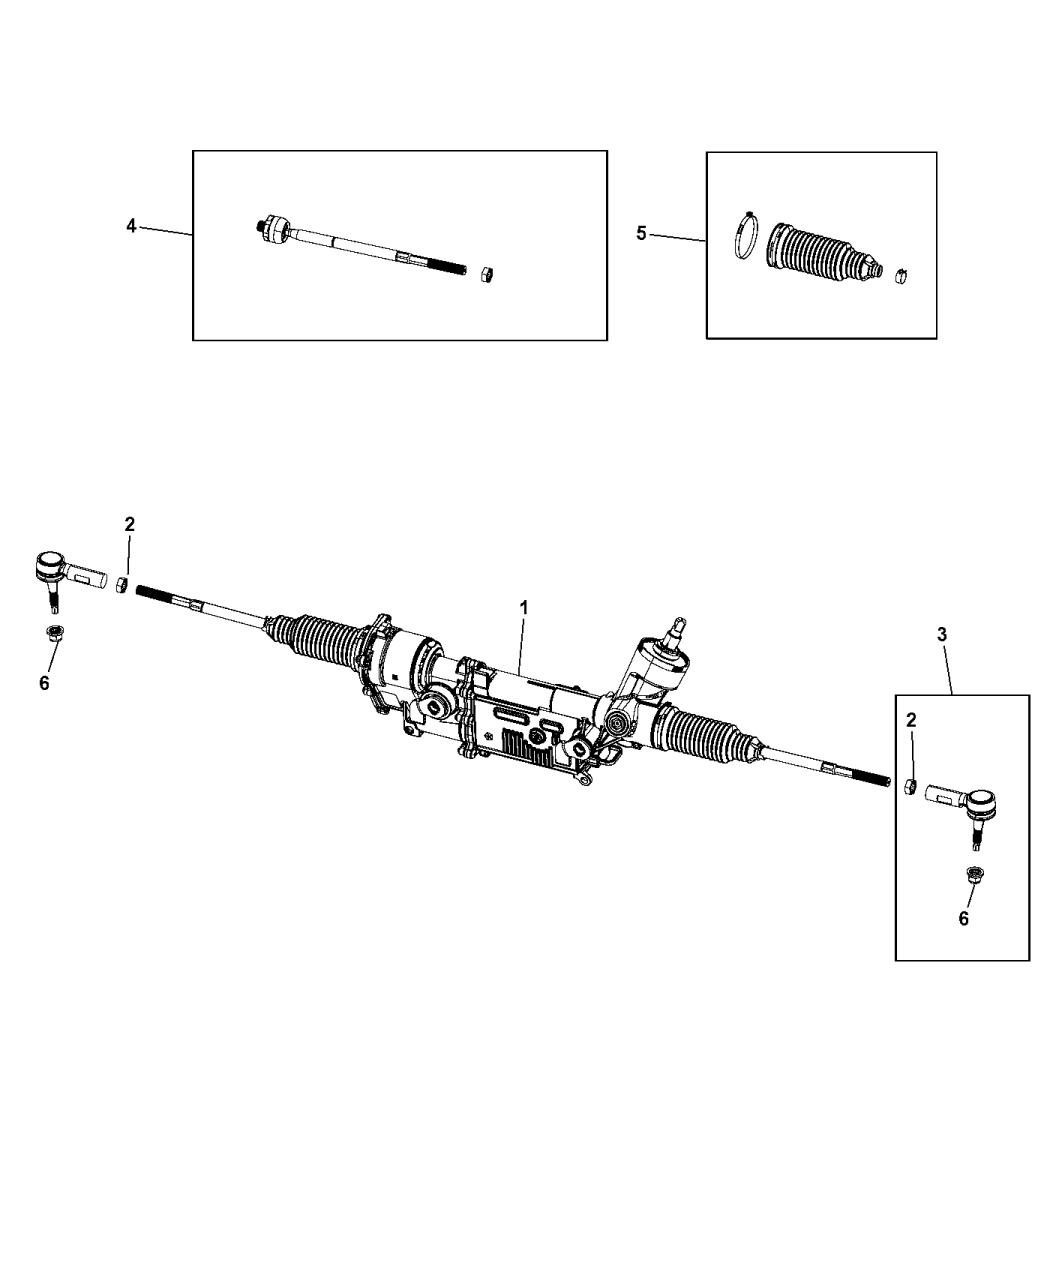 5154727aj Genuine Mopar Gear Rack And Pinion